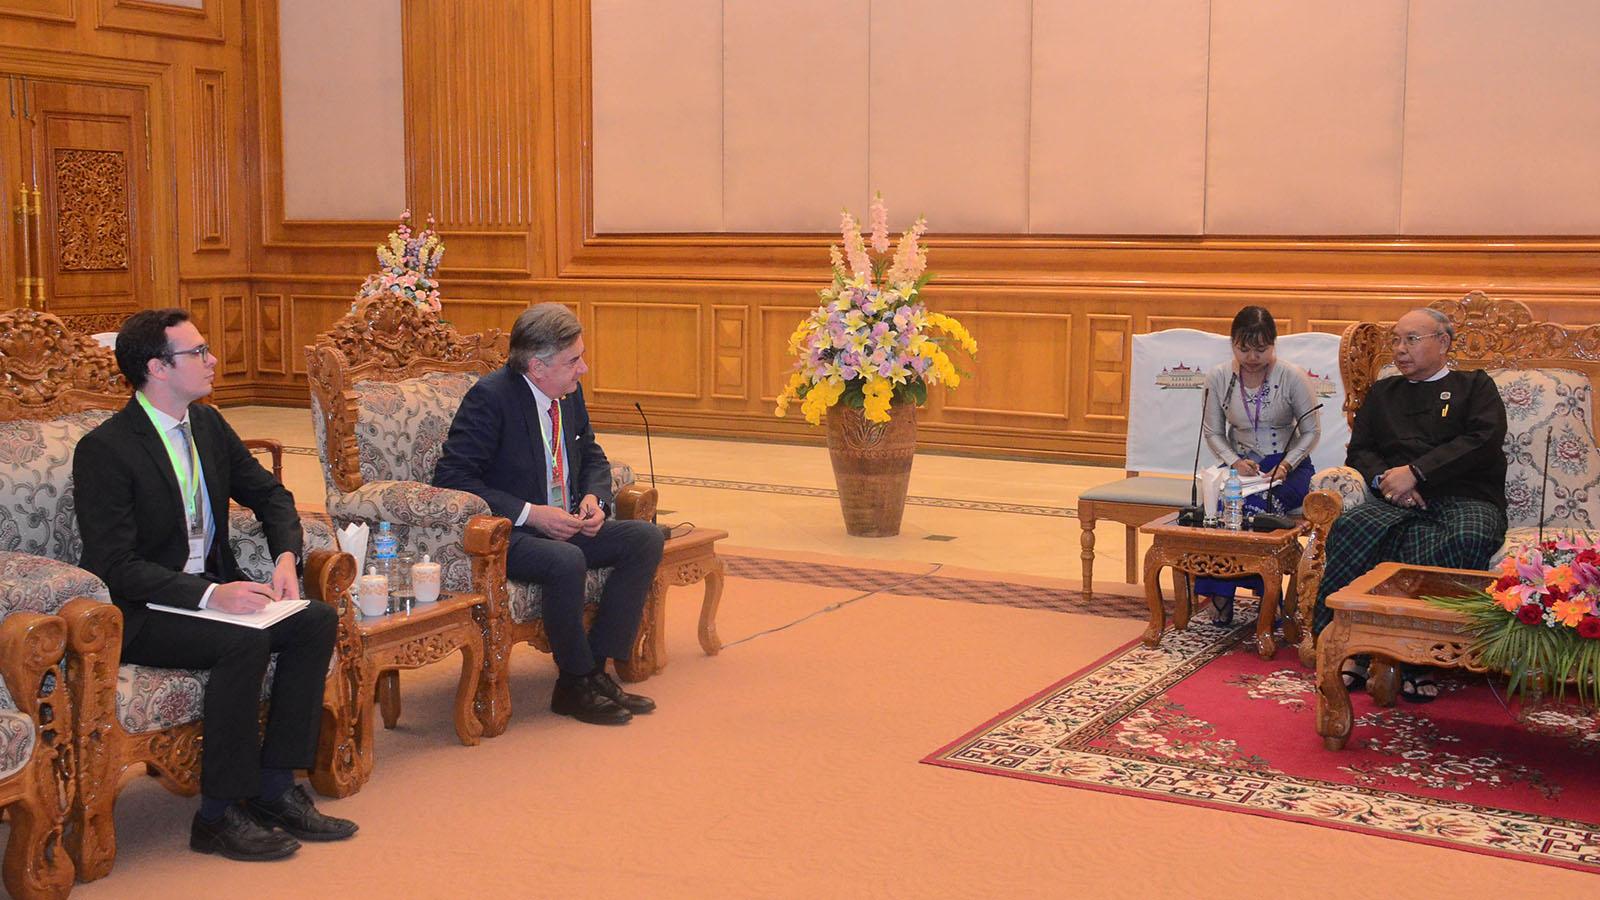 Amyotha Hluttaw Speaker Mahn Win Khaing Than meets with German Ambassador Mr Thomas Karl Neisinger in Nay Pyi Taw yesterday.Photo: MNA